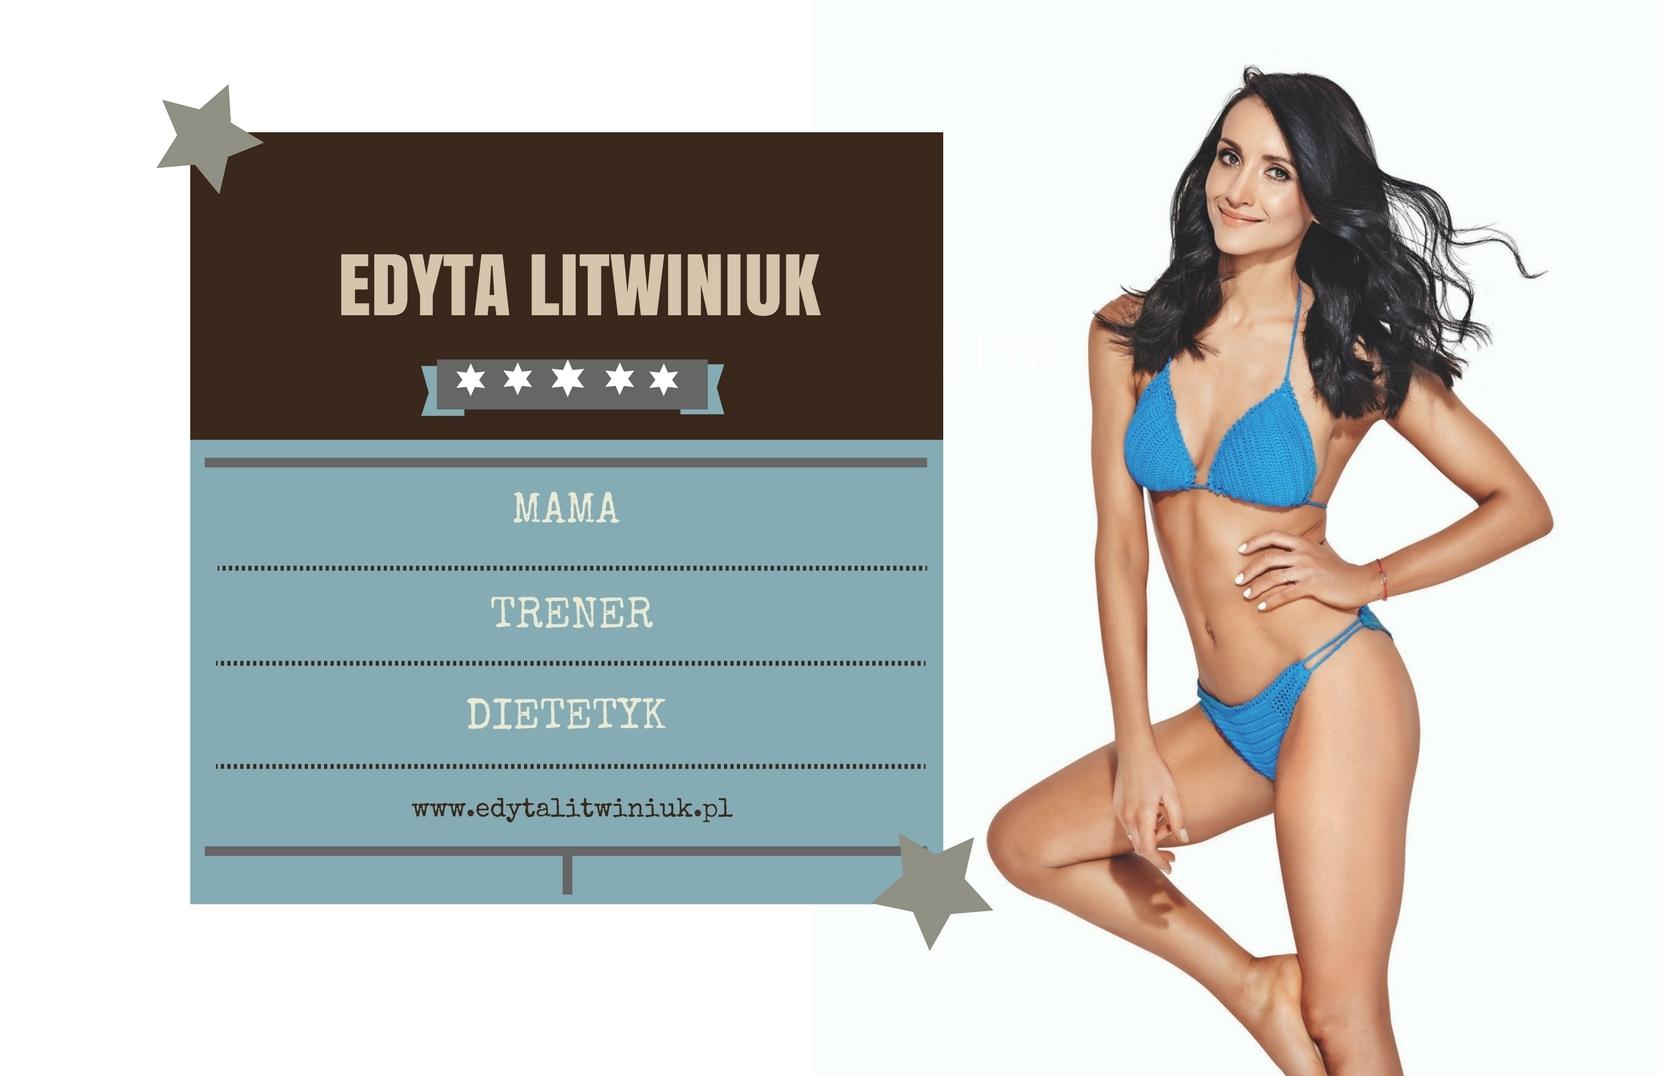 Edyta Litwiniuk | Trening-Dieta-Styl życia